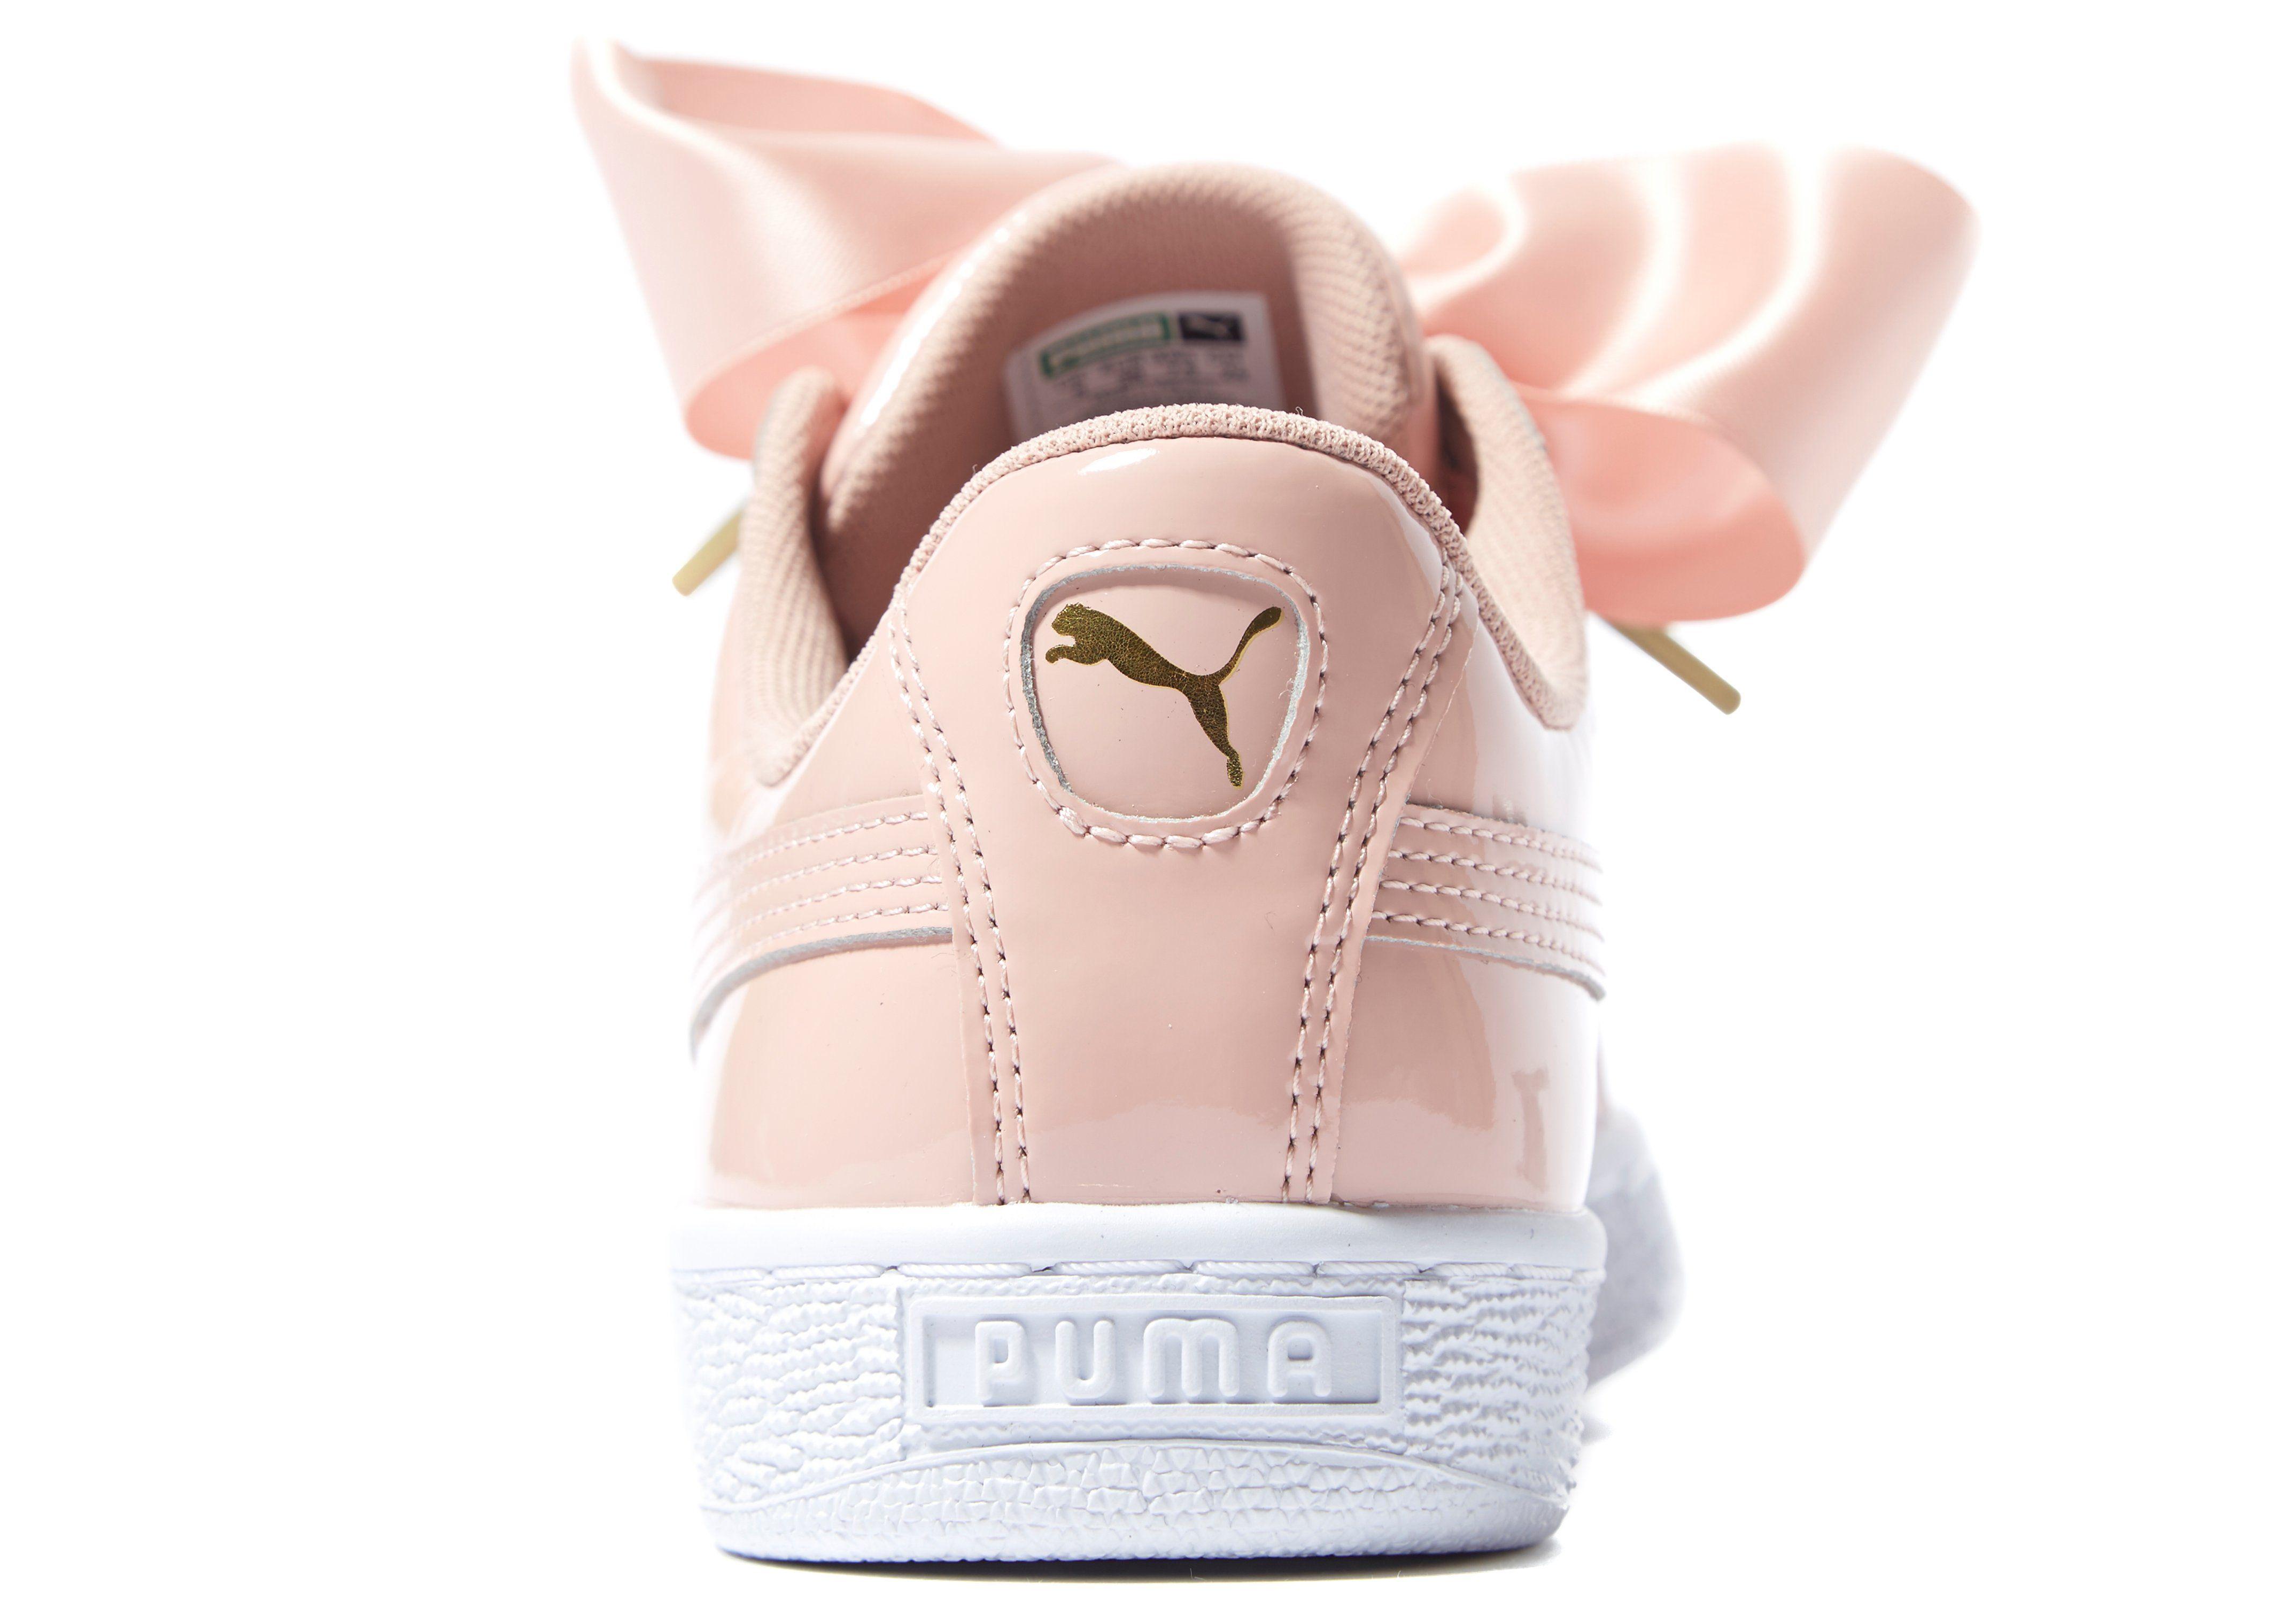 PUMA Basket Heart Patent Women's